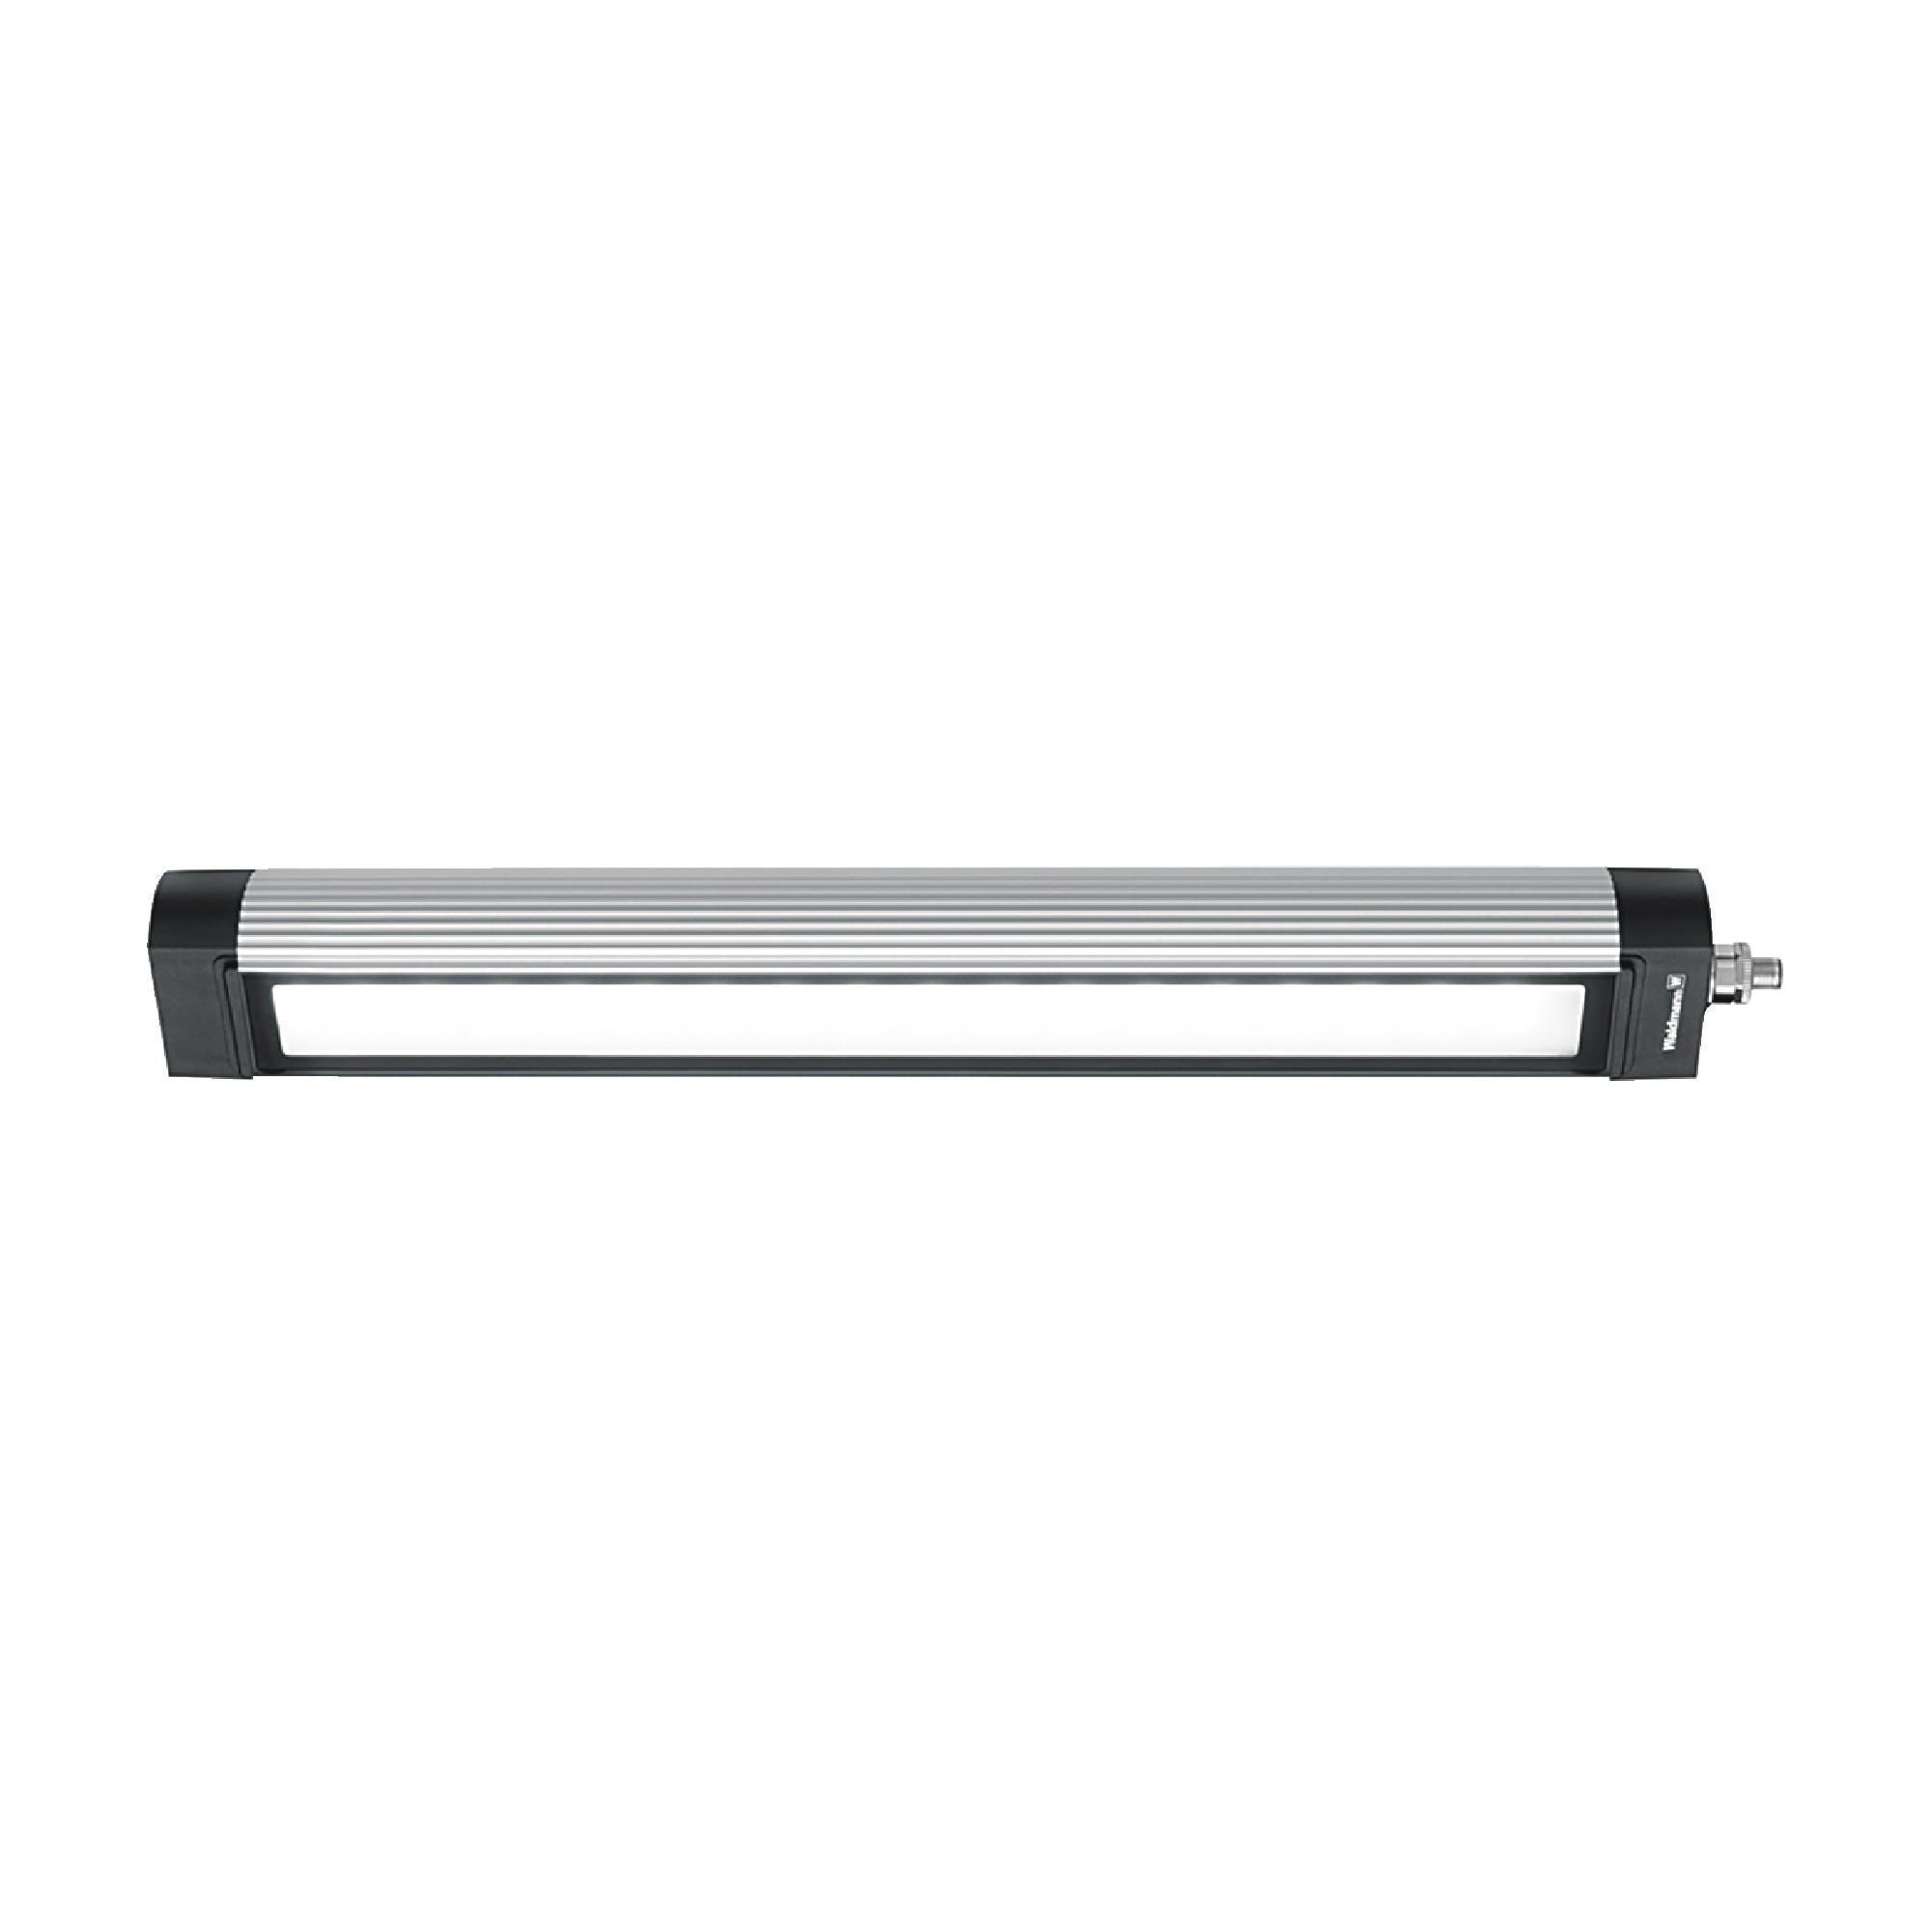 WALDMANN LIGHTING MACH LED PLUS 24 LED Machine Luminaire